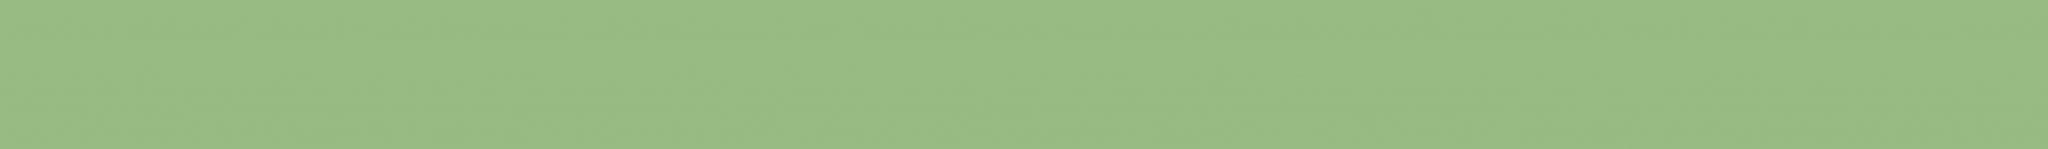 Mono стеклянный бордюр (фисташковый) 30х2